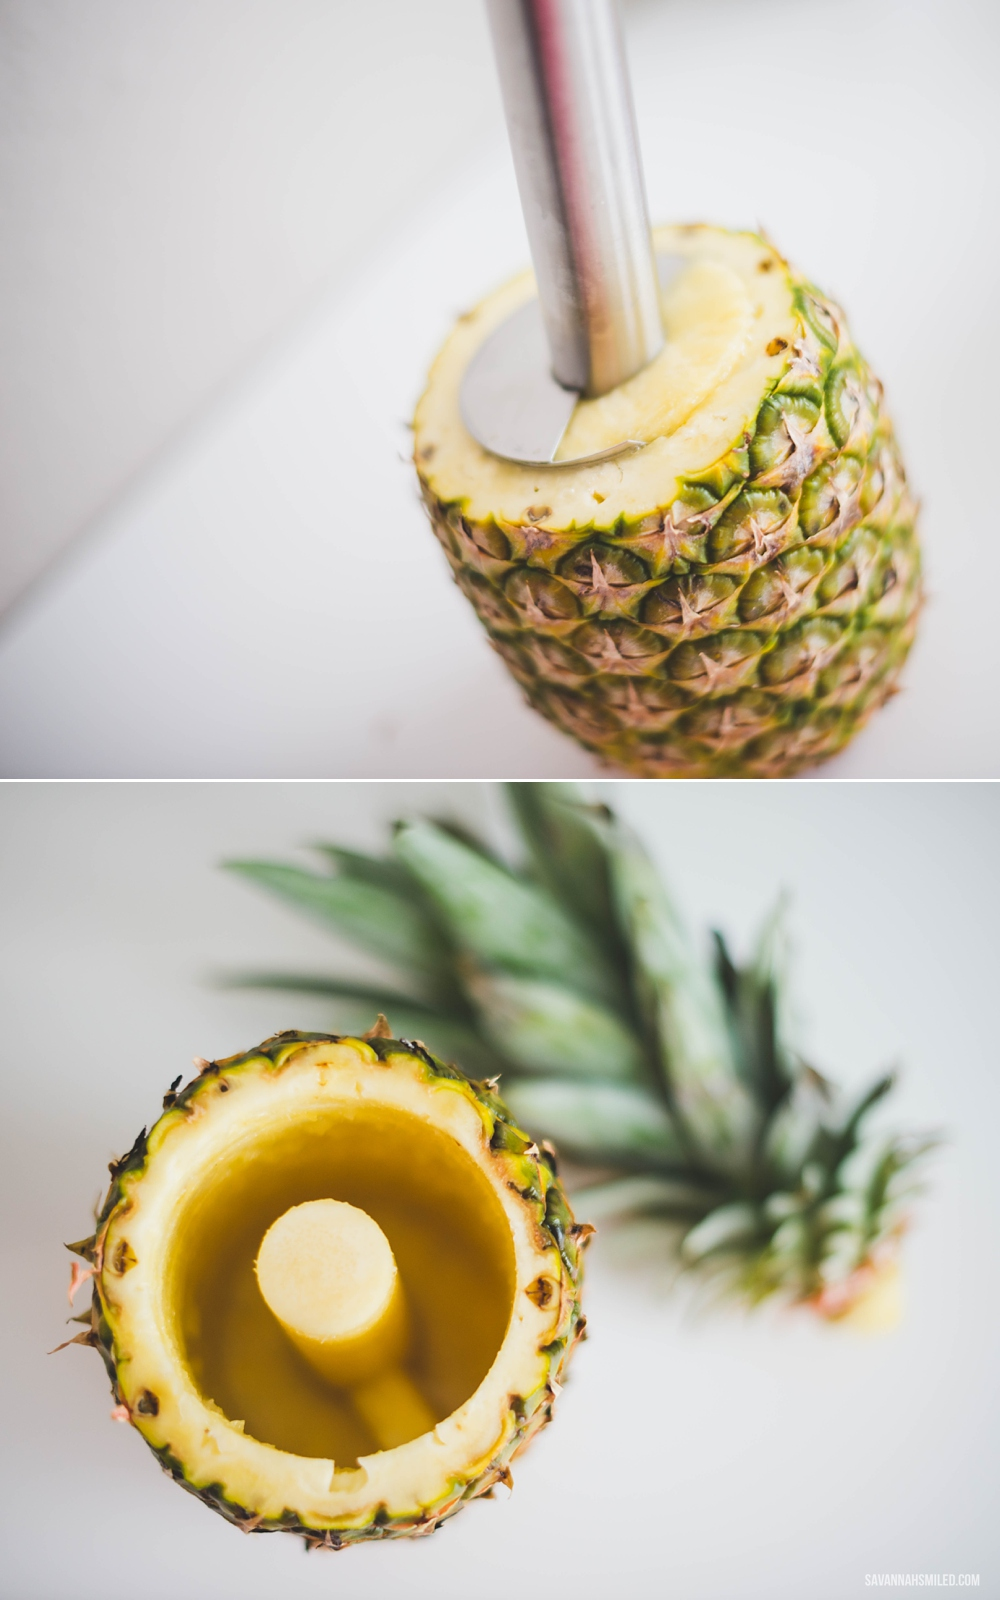 pinapple-slicer-amazon-8.jpg